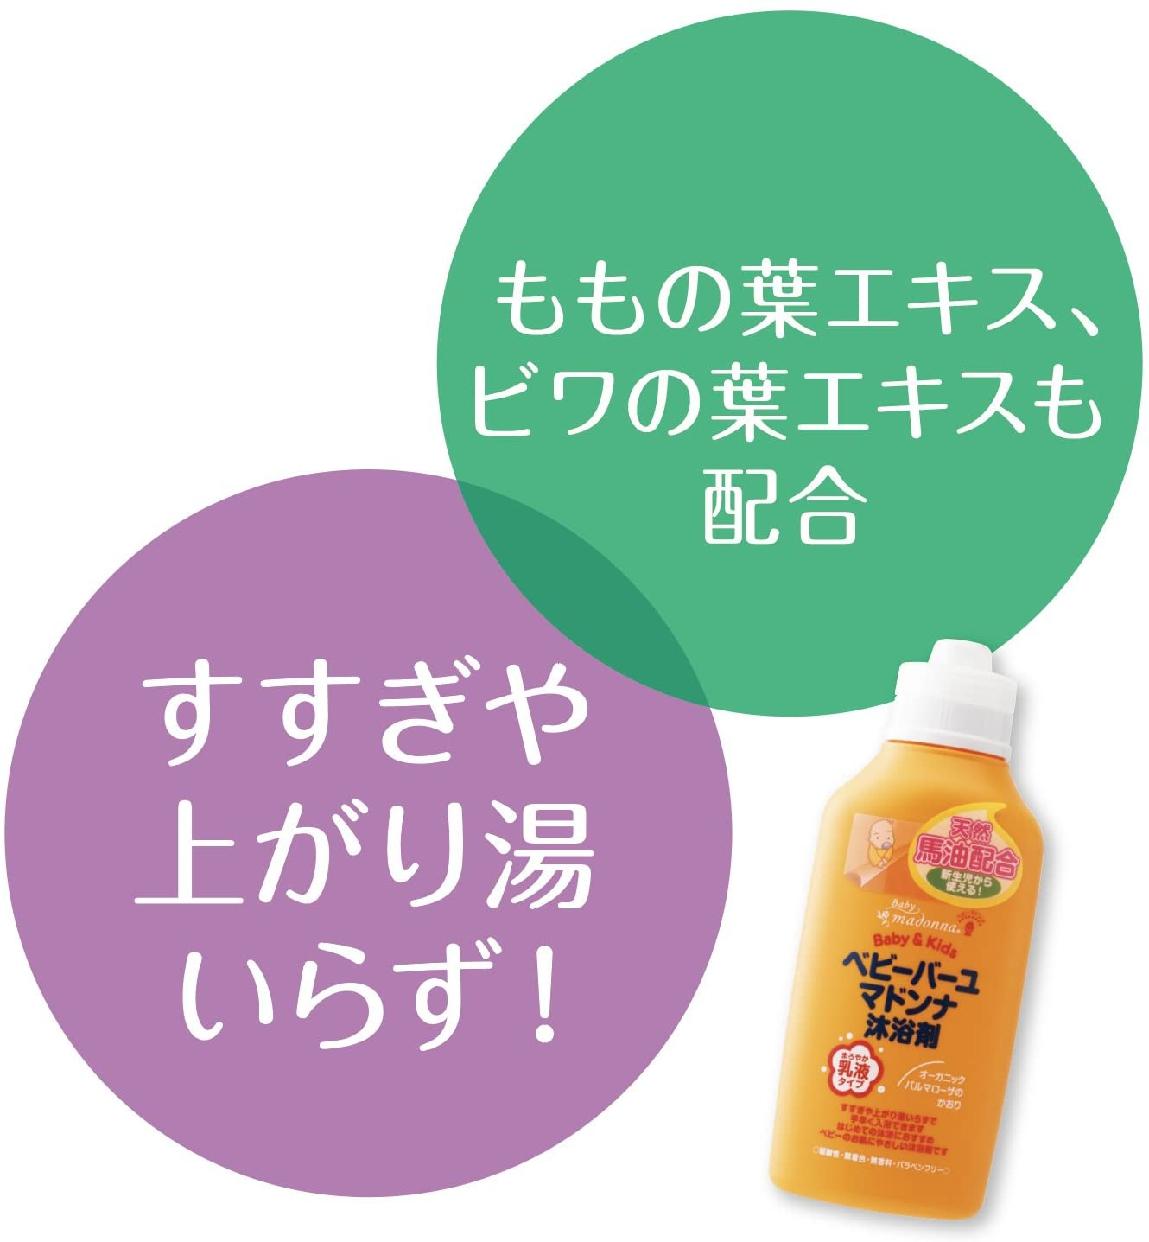 MADONNA(マドンナ)ベビーバーユマドンナ沐浴剤の商品画像6